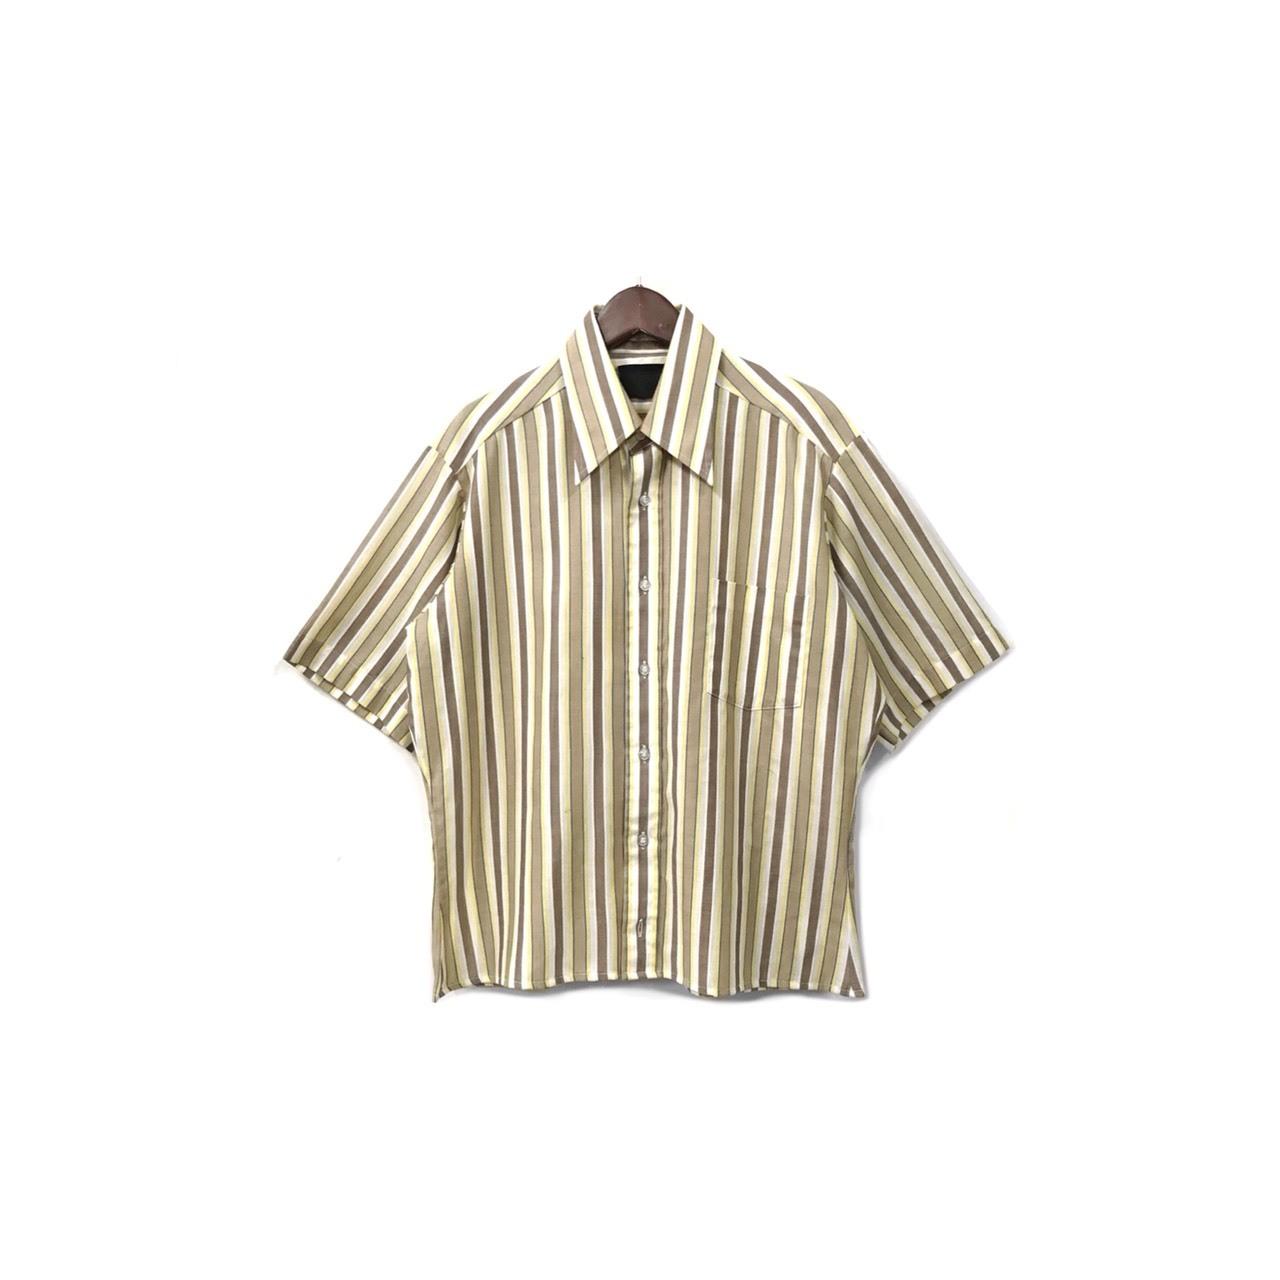 USED - Remake Stripe Shirt ¥9000+tax